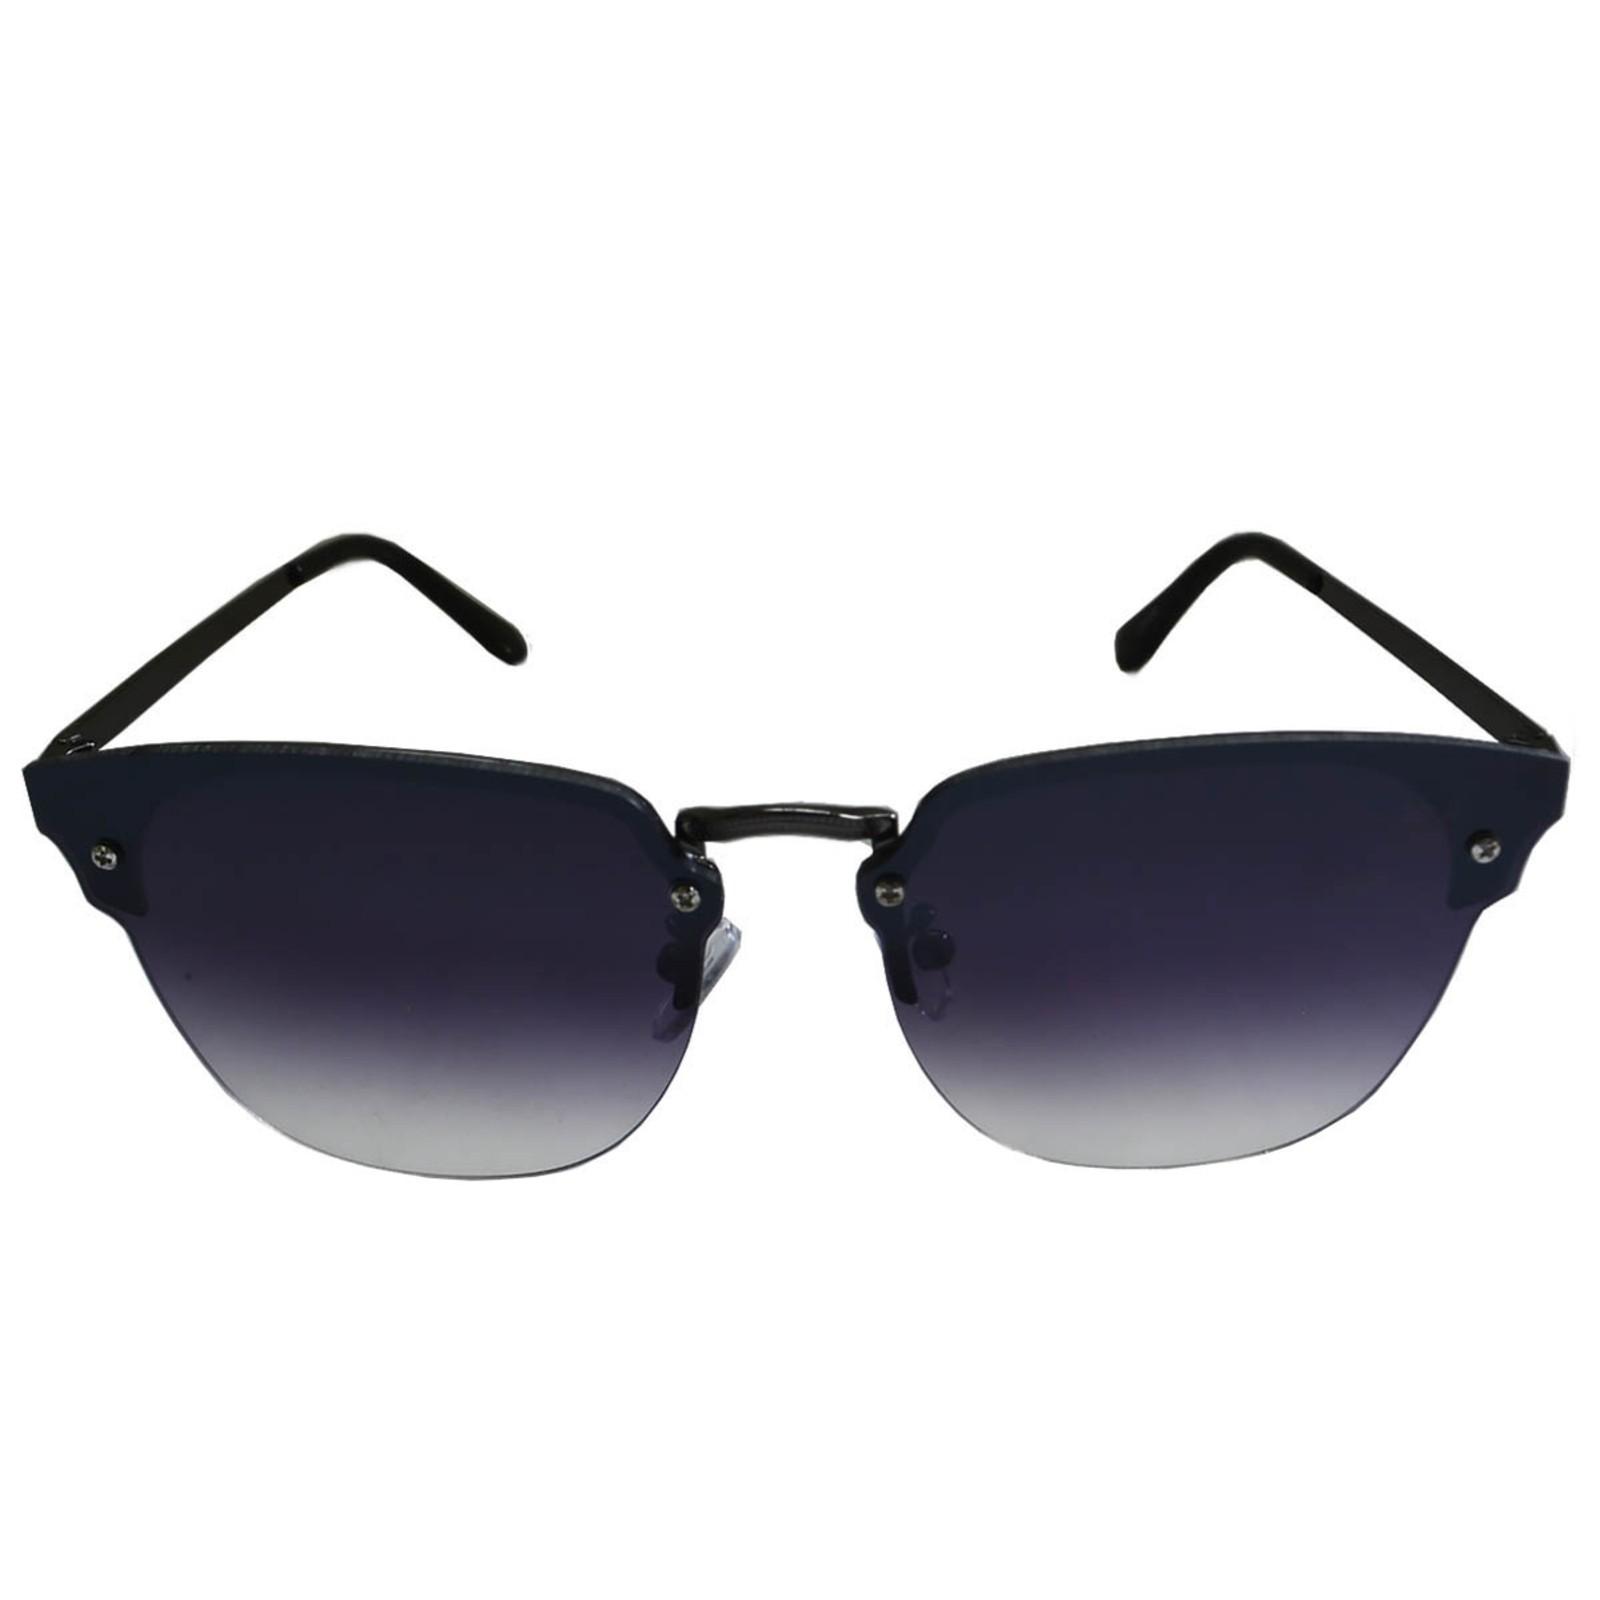 Óculos De Sol Mackage Feminino Metal Gateado Rimless - Preto